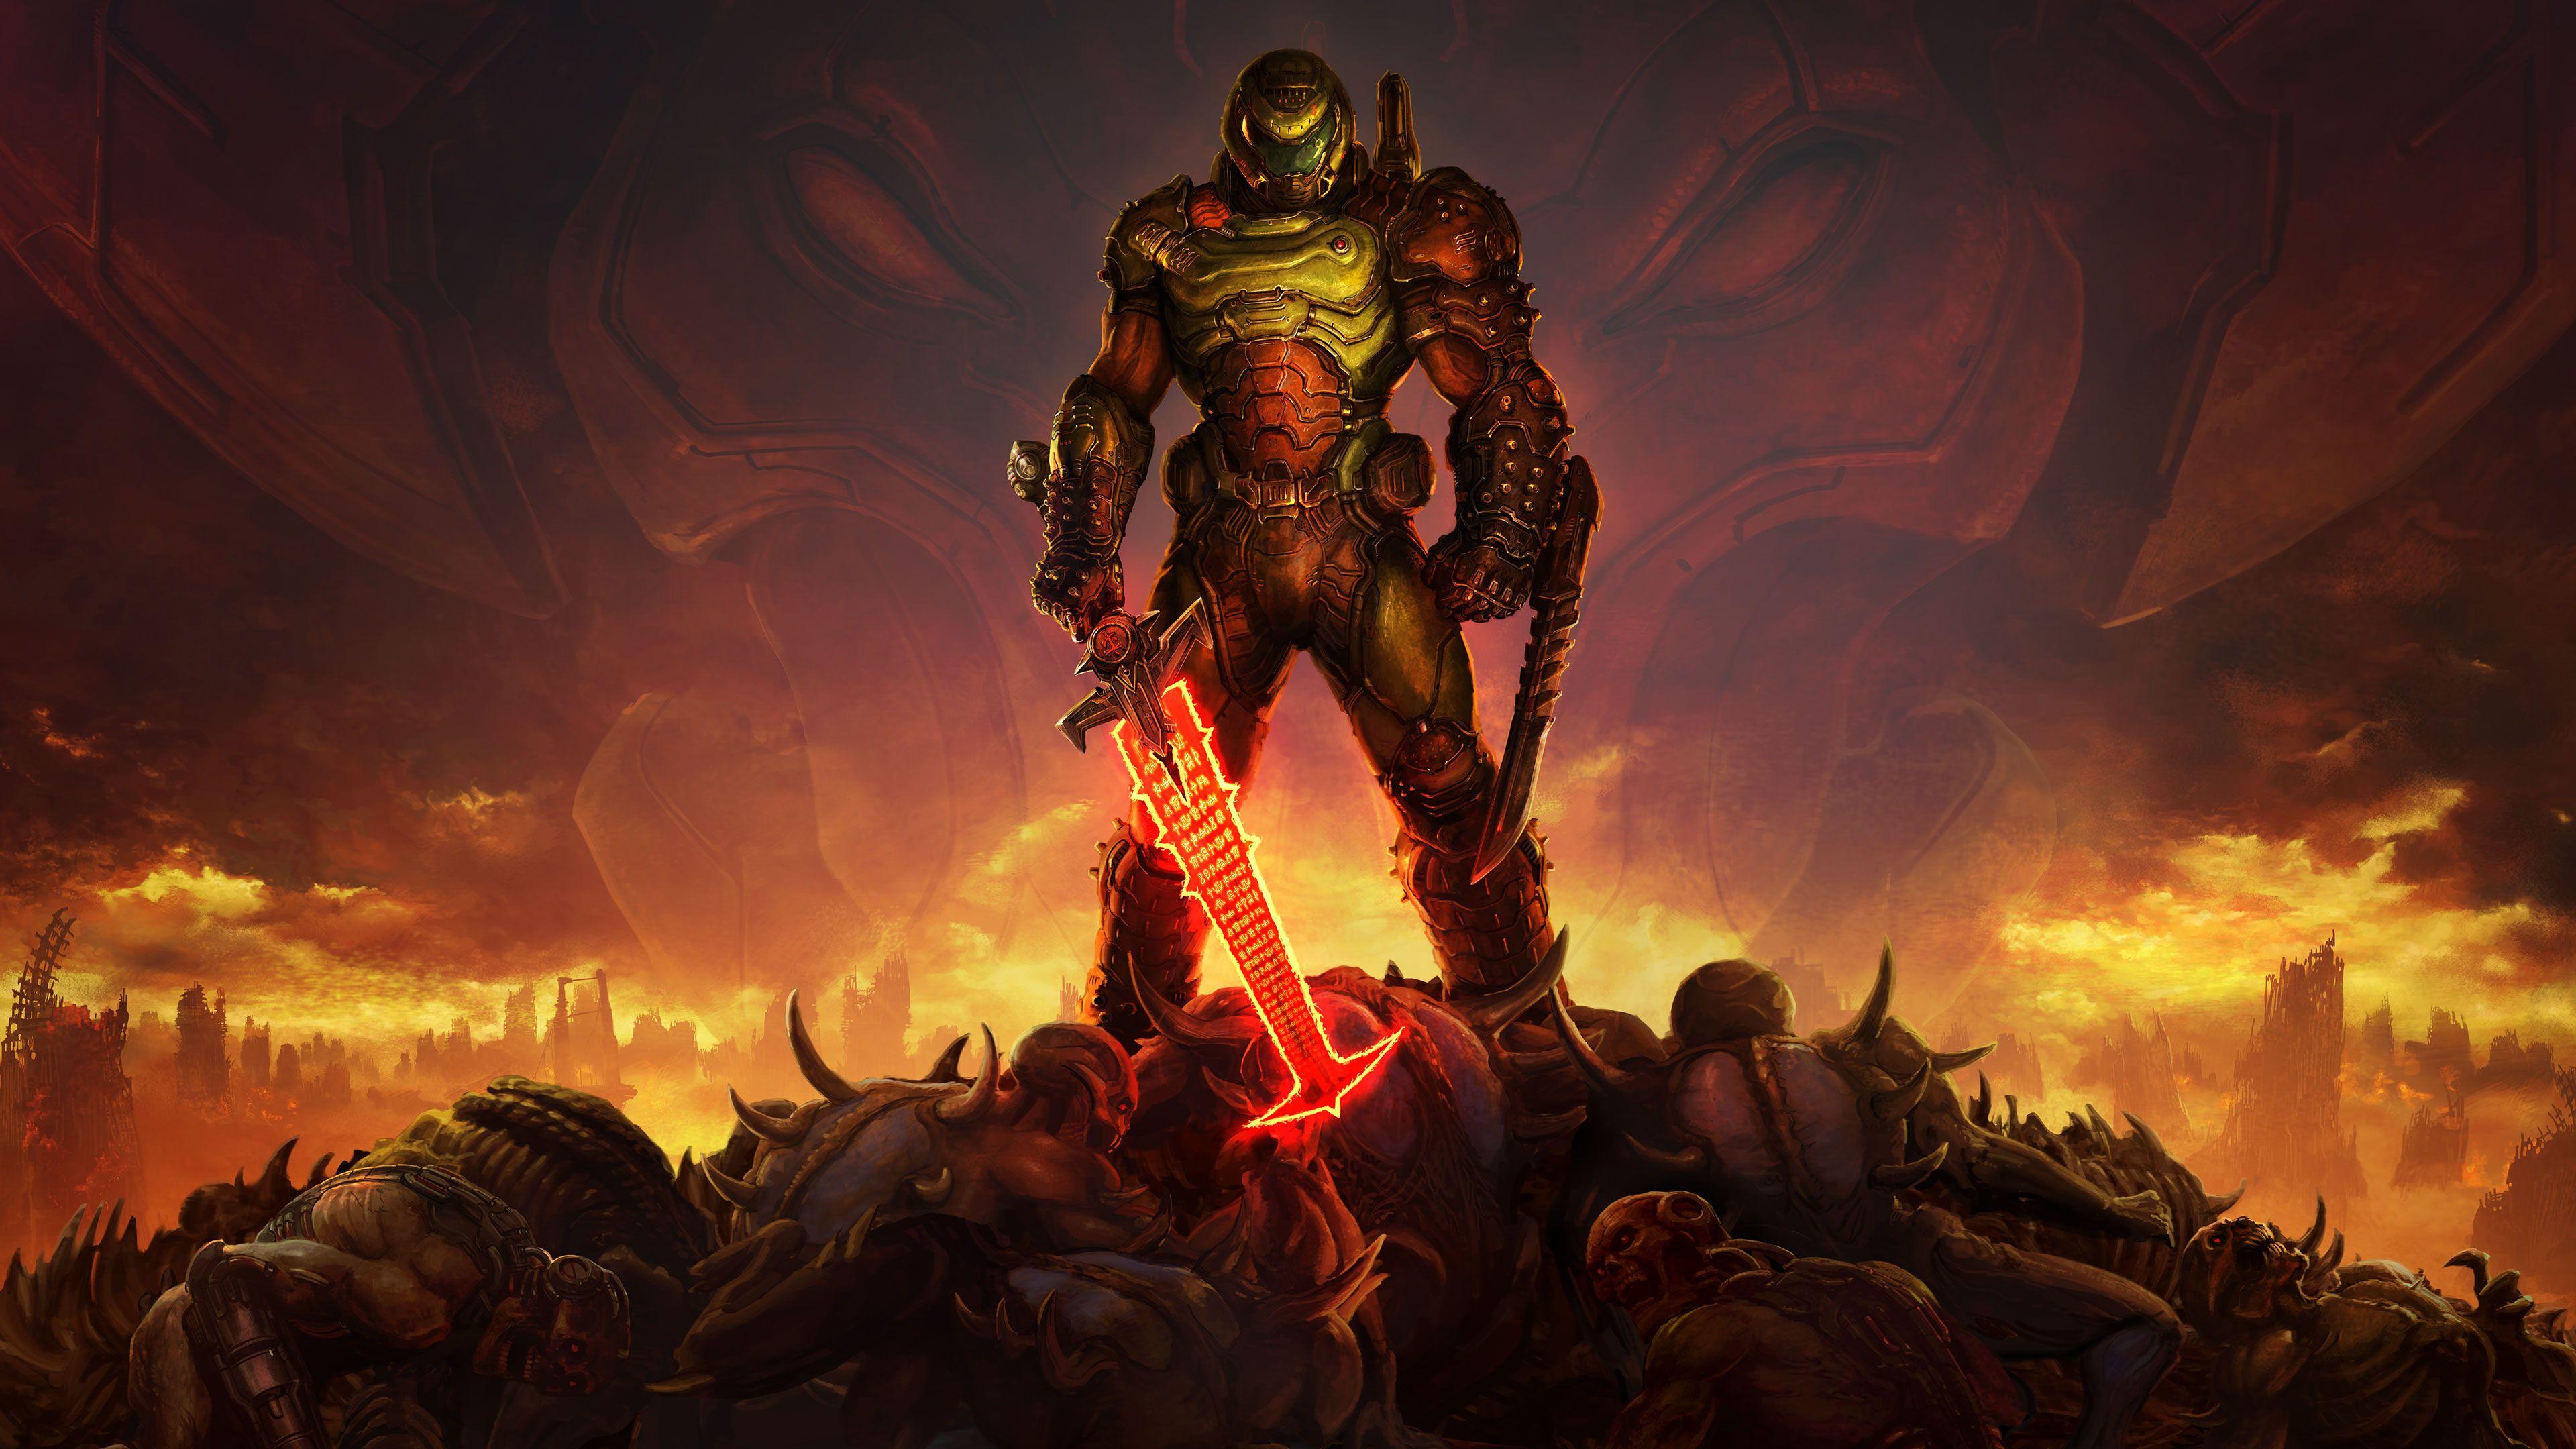 The Doom Slayer [3840x2160] in 2020 (With images) Doom